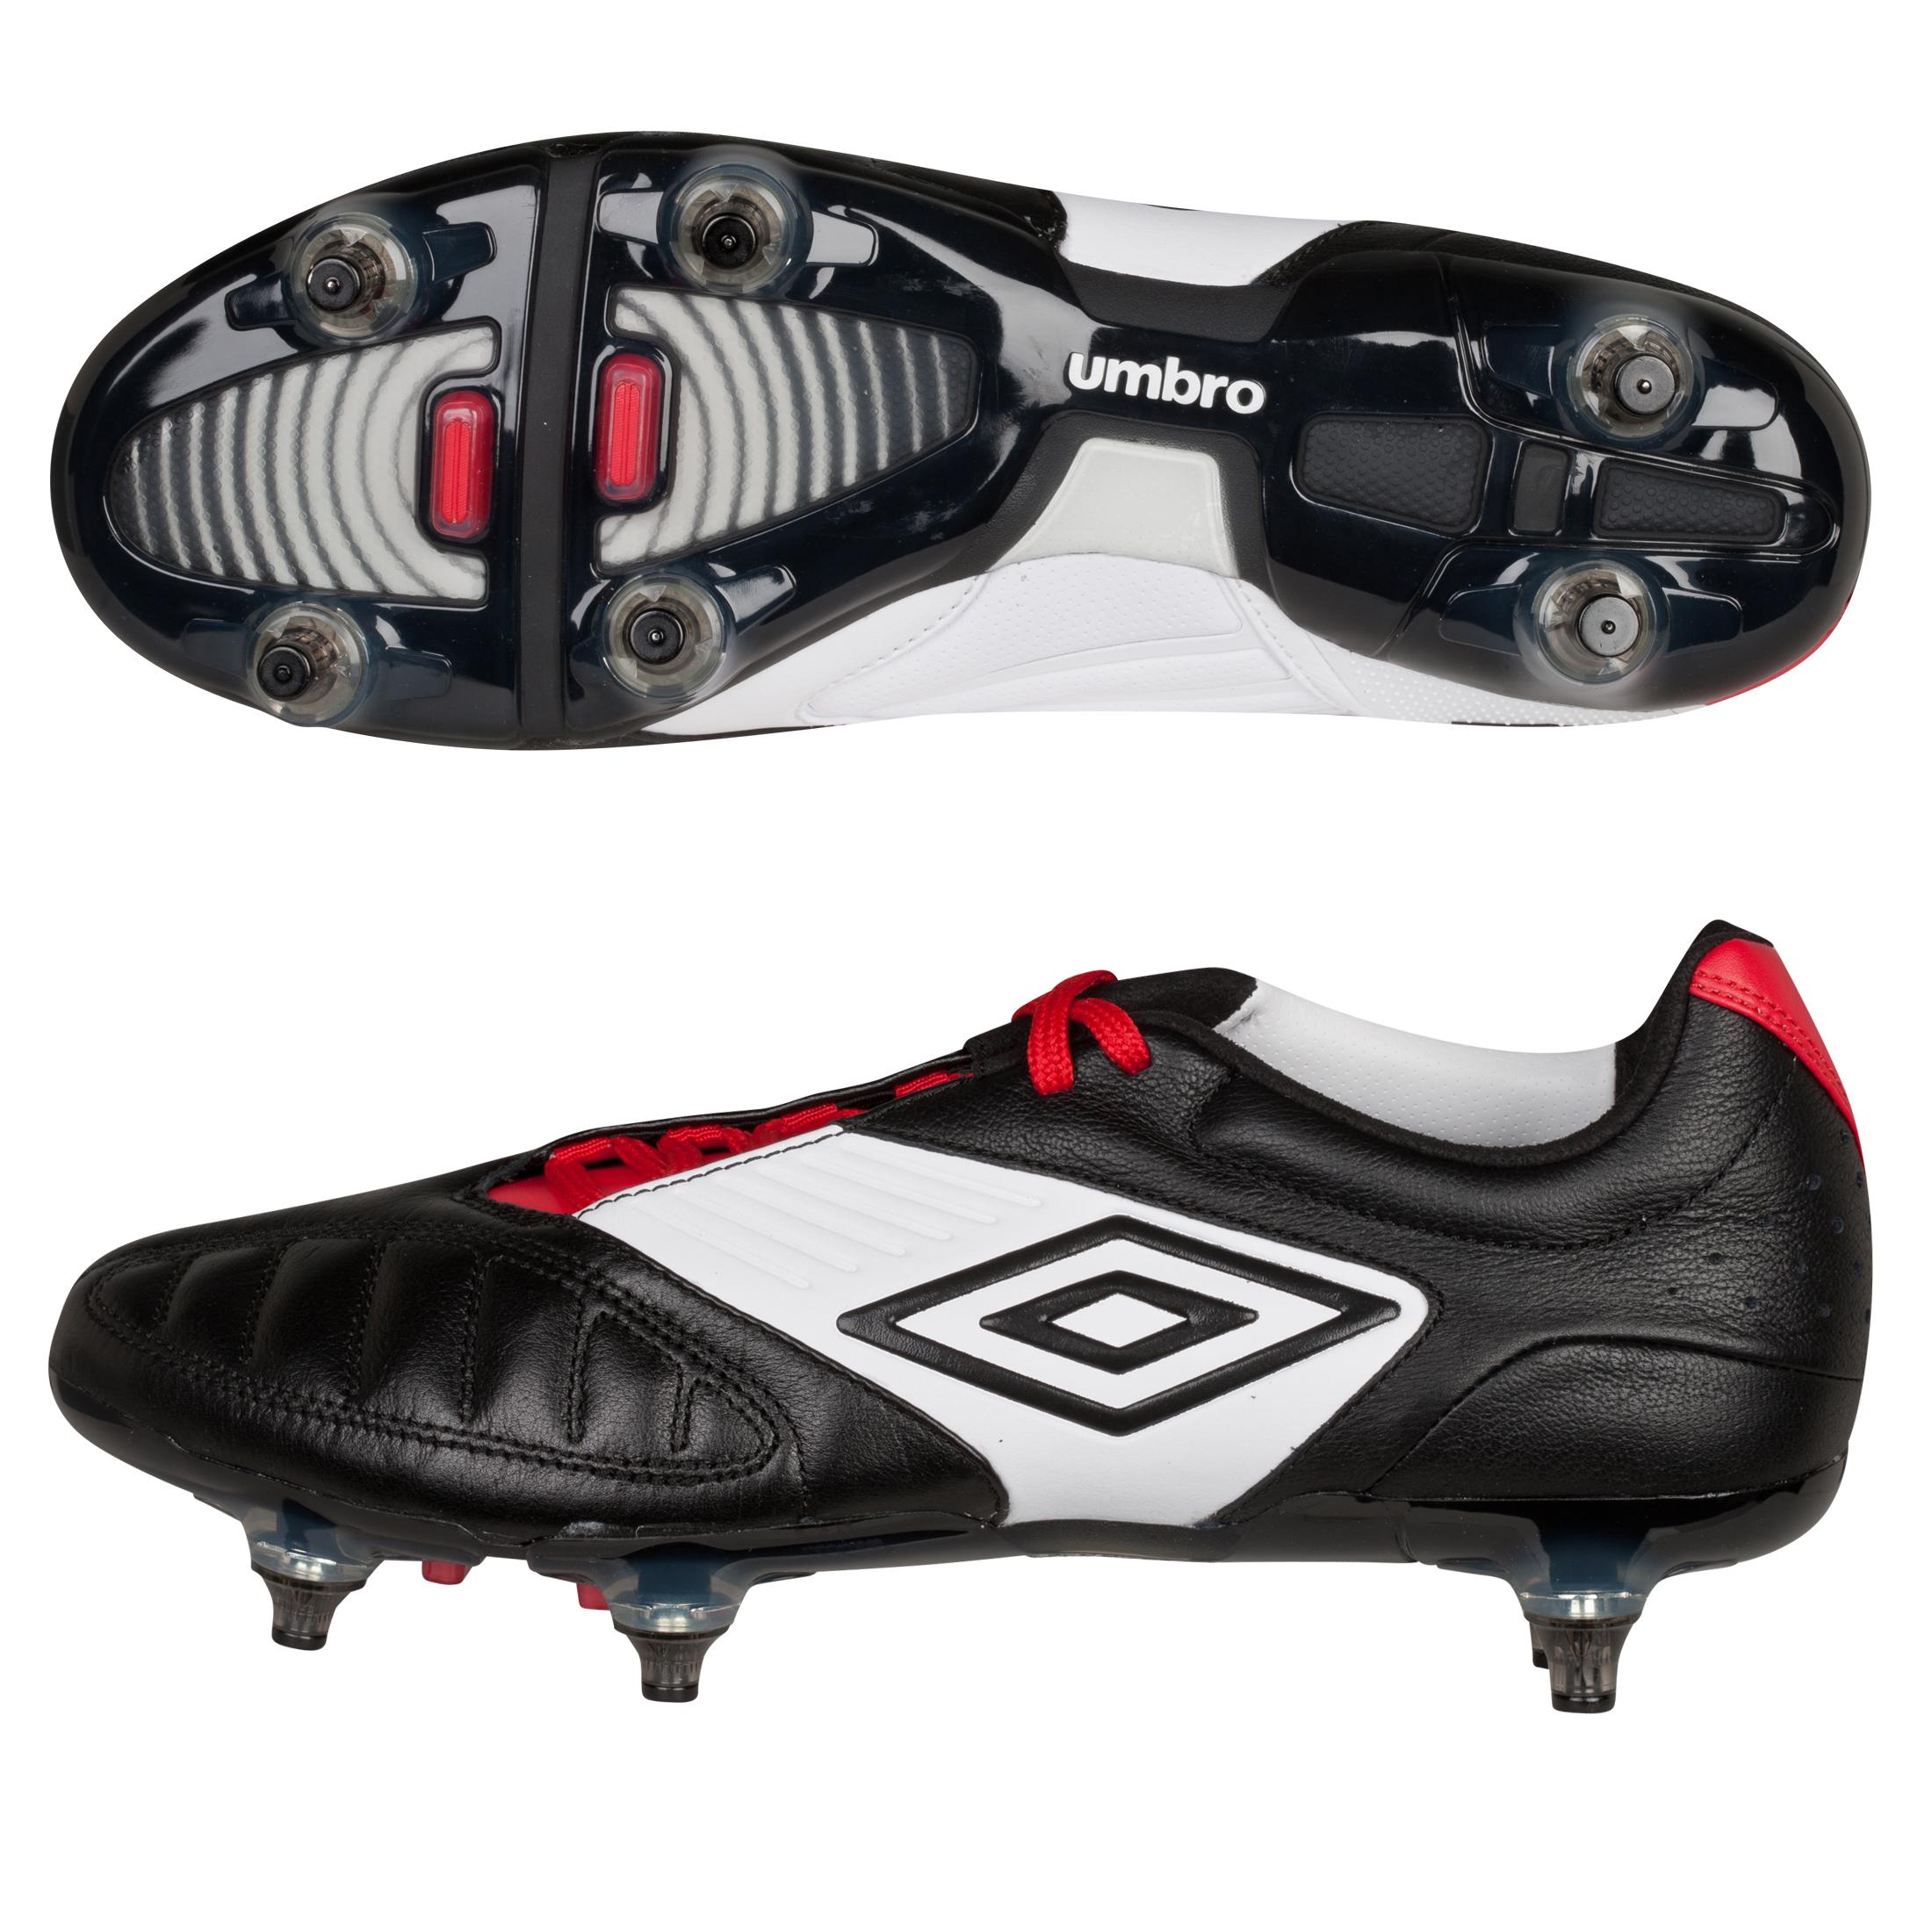 Umbro Geometra Pro Soft Ground Football Boots - Black/White/True Red